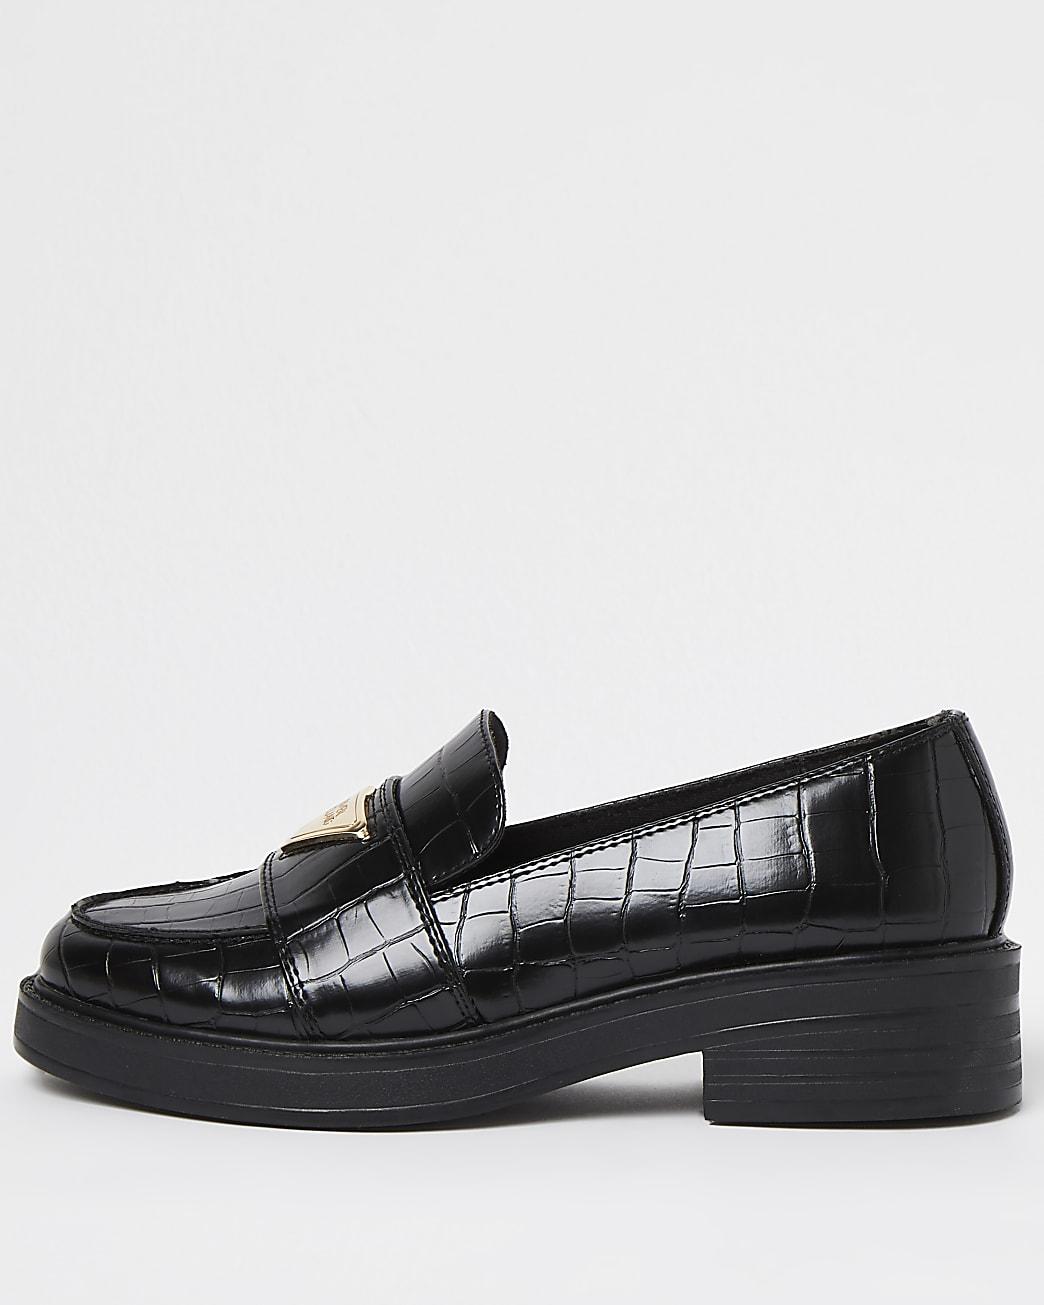 Black croc embossed loafers